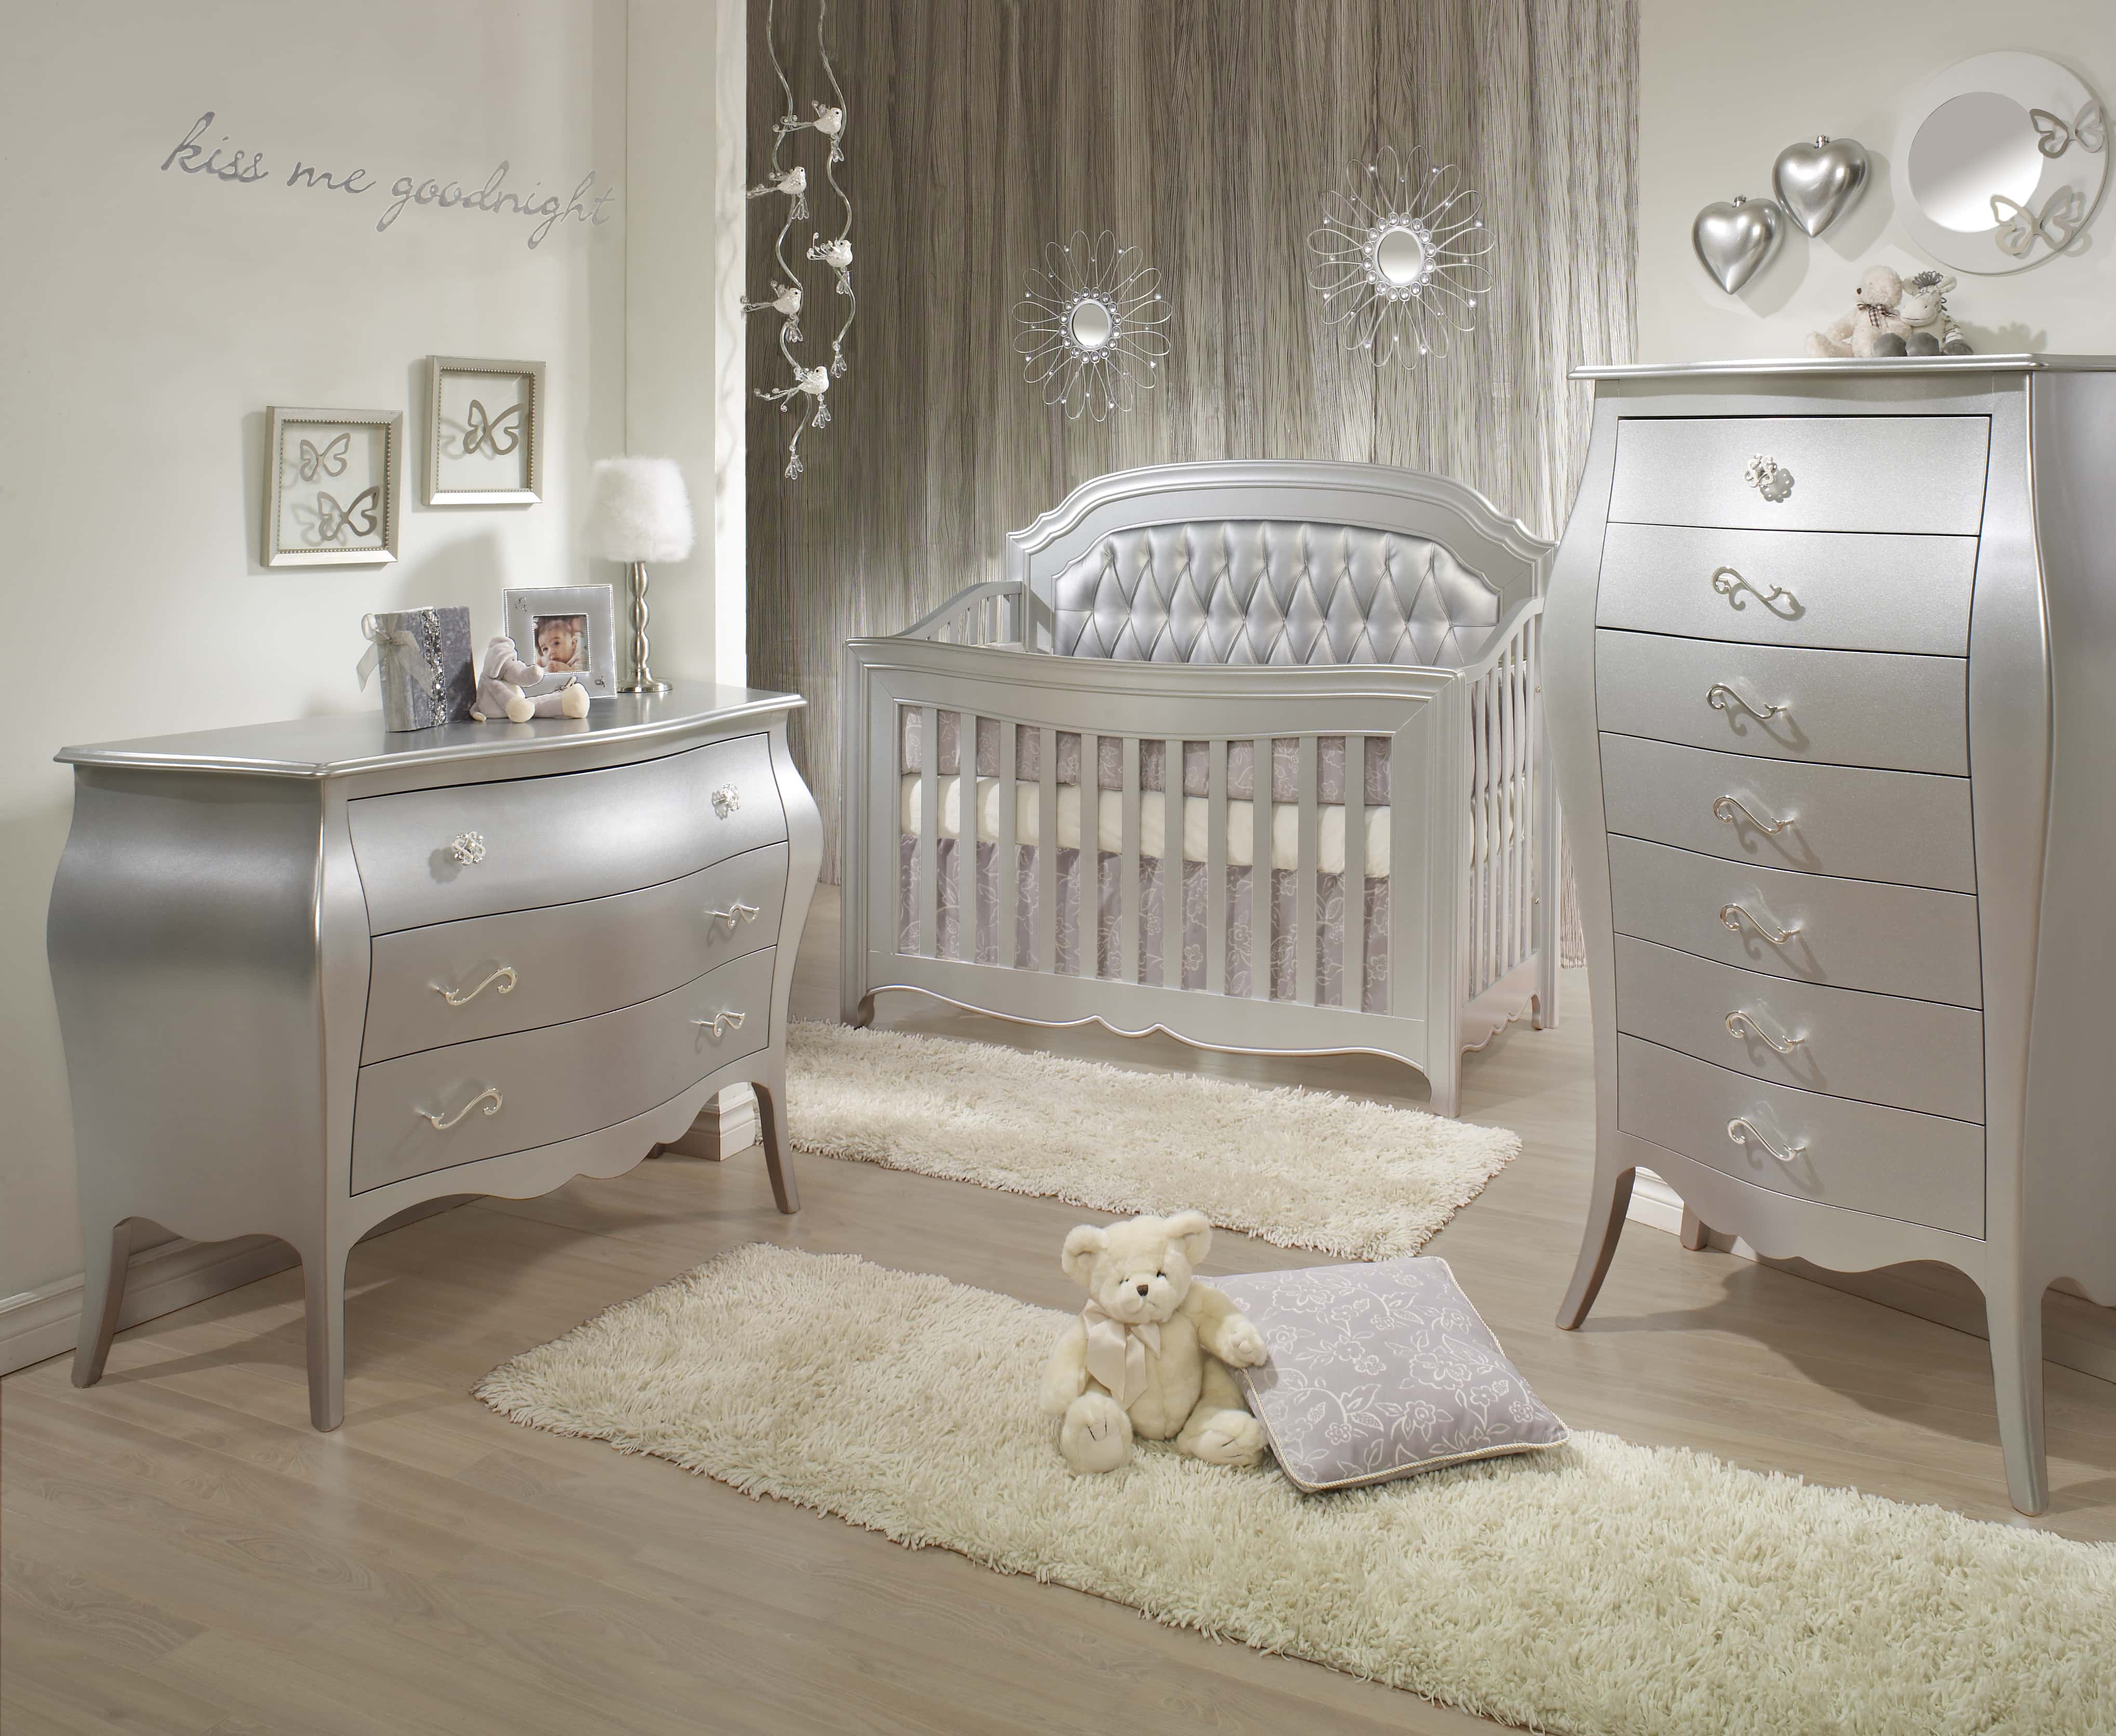 Best 25 Baby Beds Ideas On Pinterest: Natart Juvenile